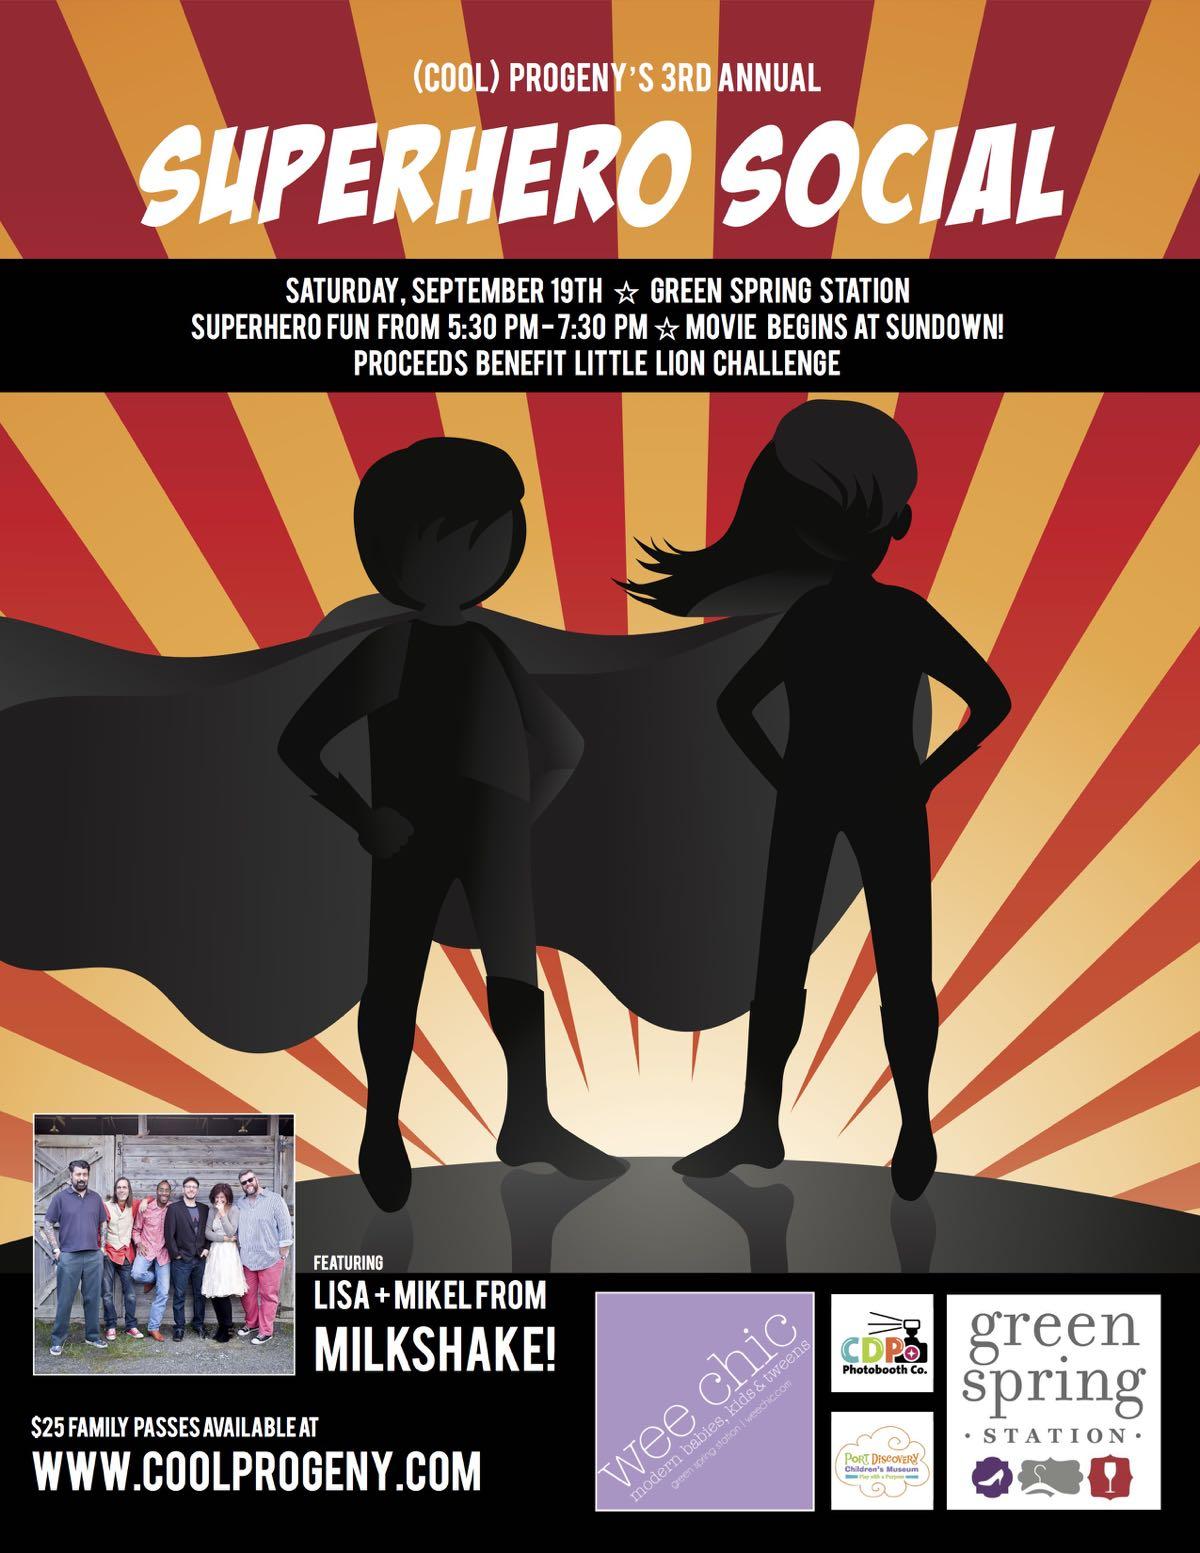 (cool) progeny superhero social